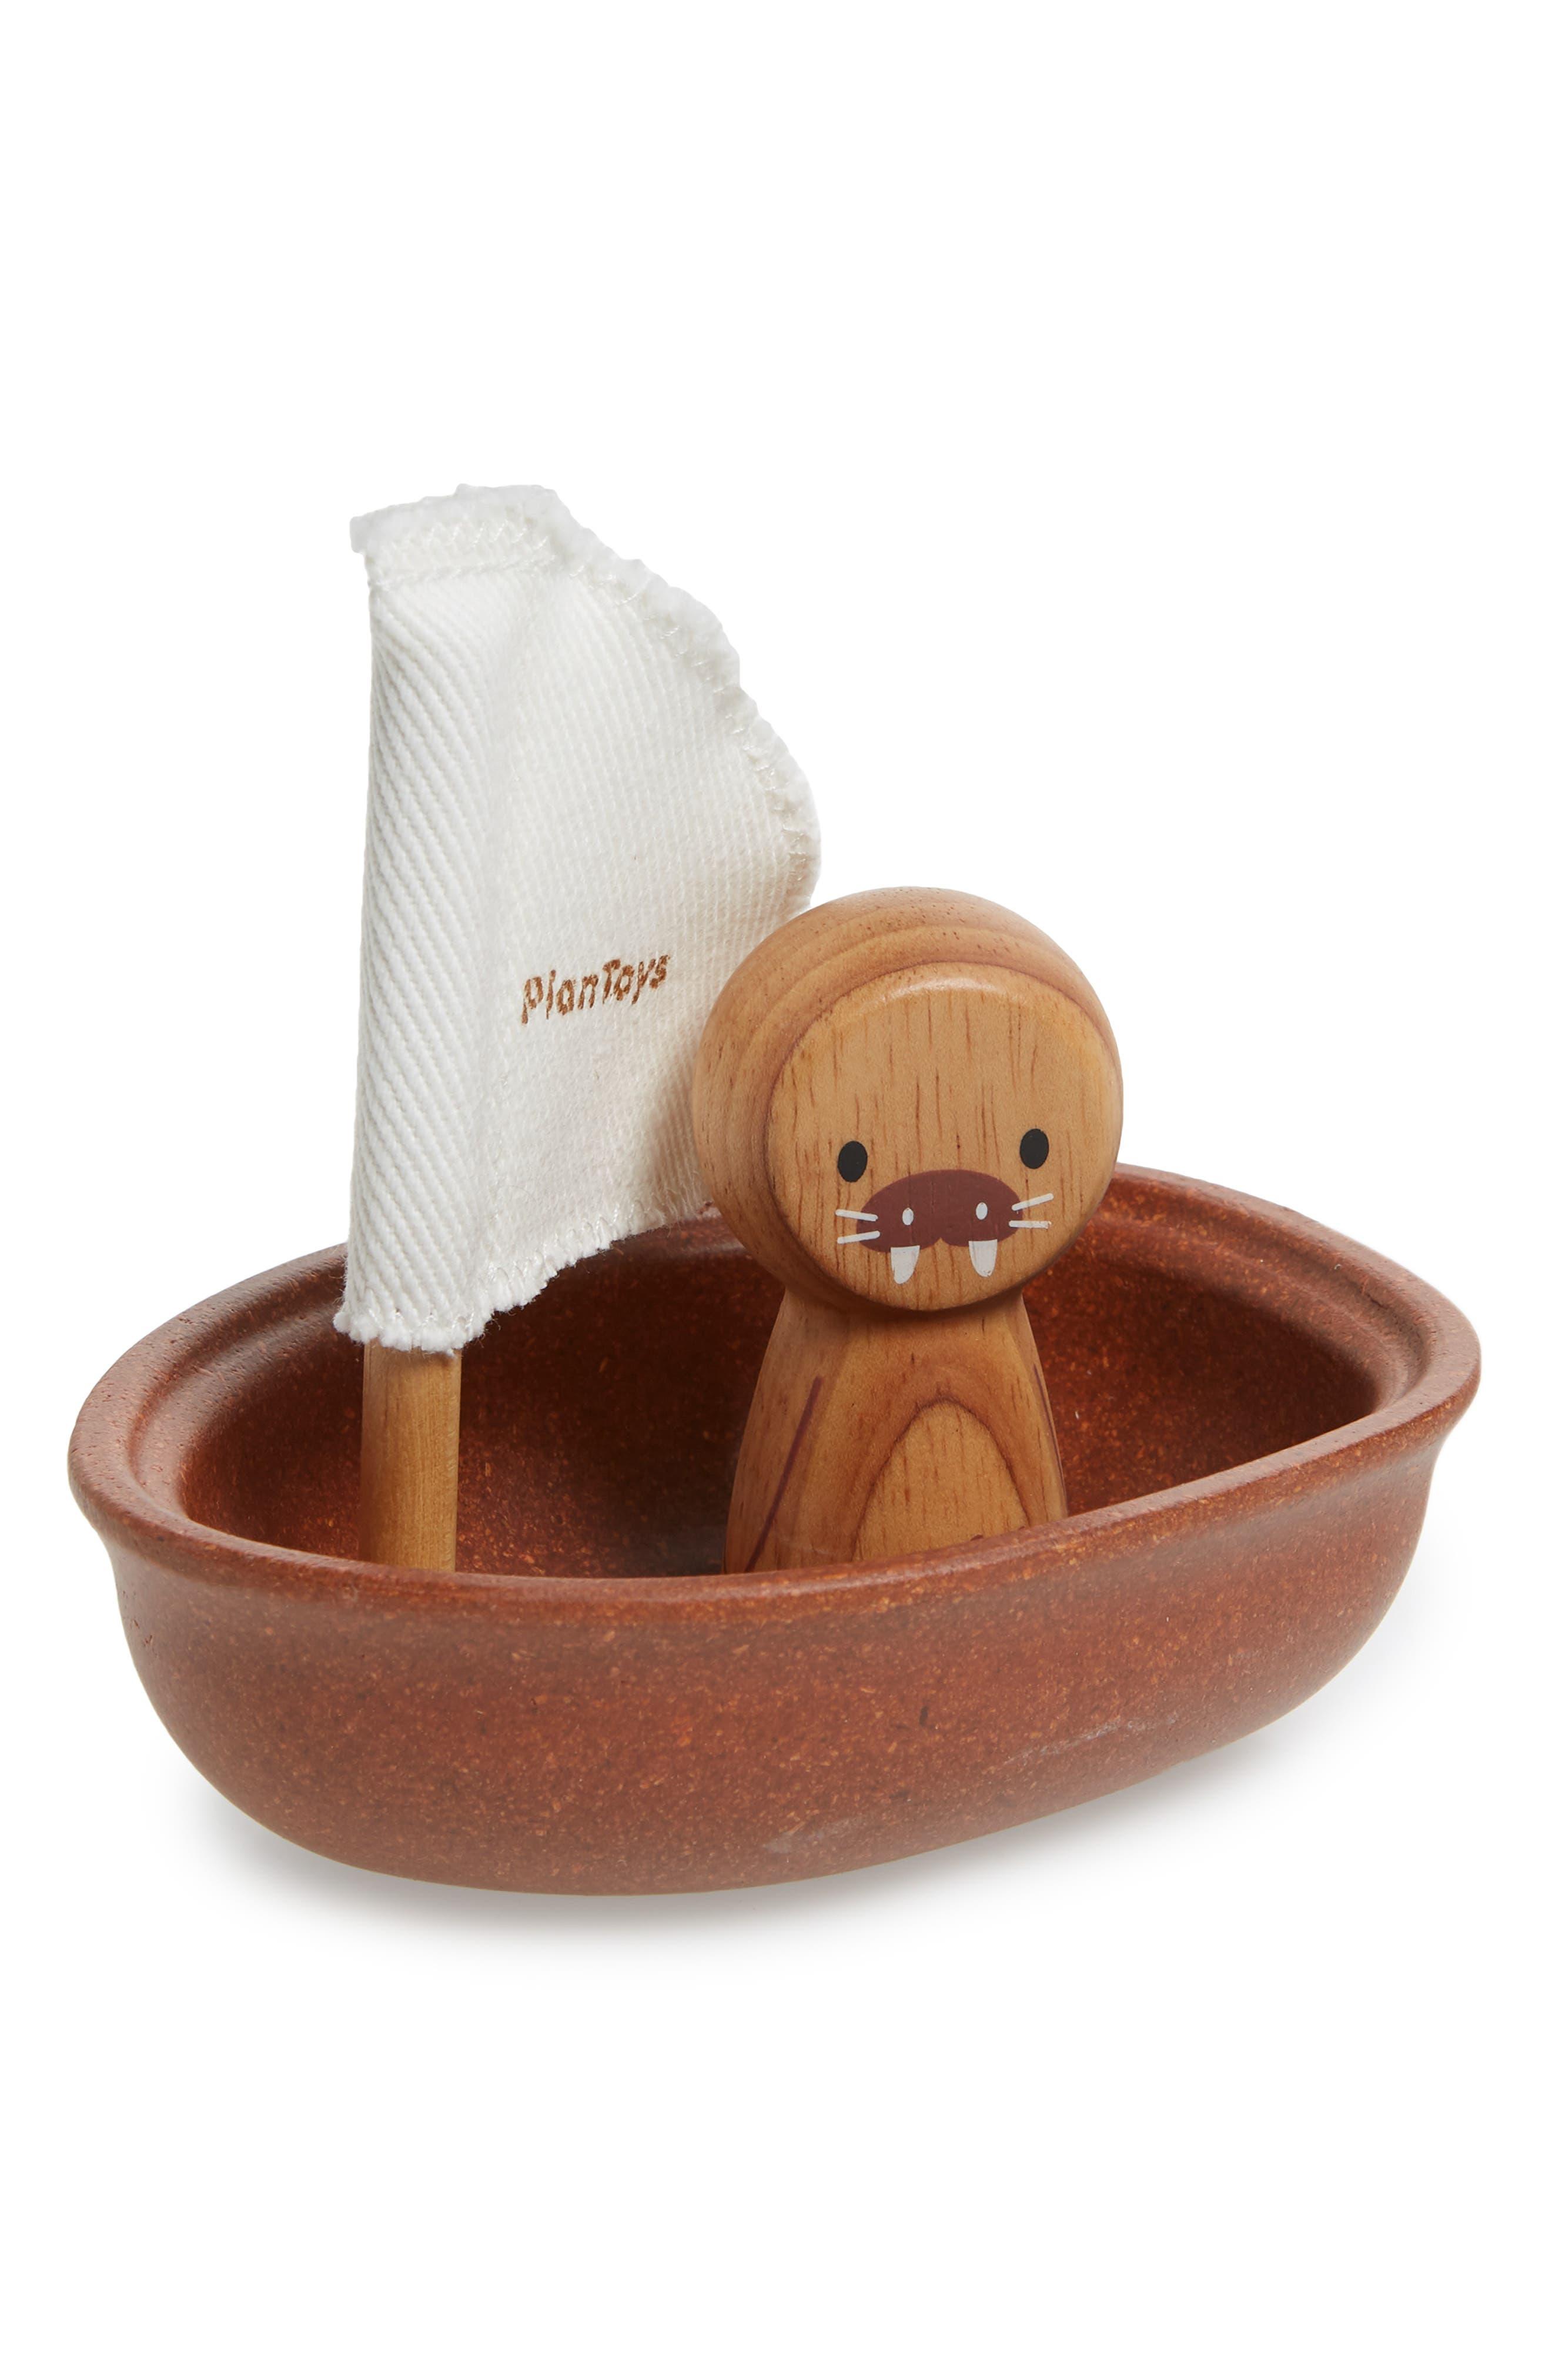 Plan Toys<sup>®</sup> Walrus Sailing Boat Toy,                             Main thumbnail 1, color,                             Brown